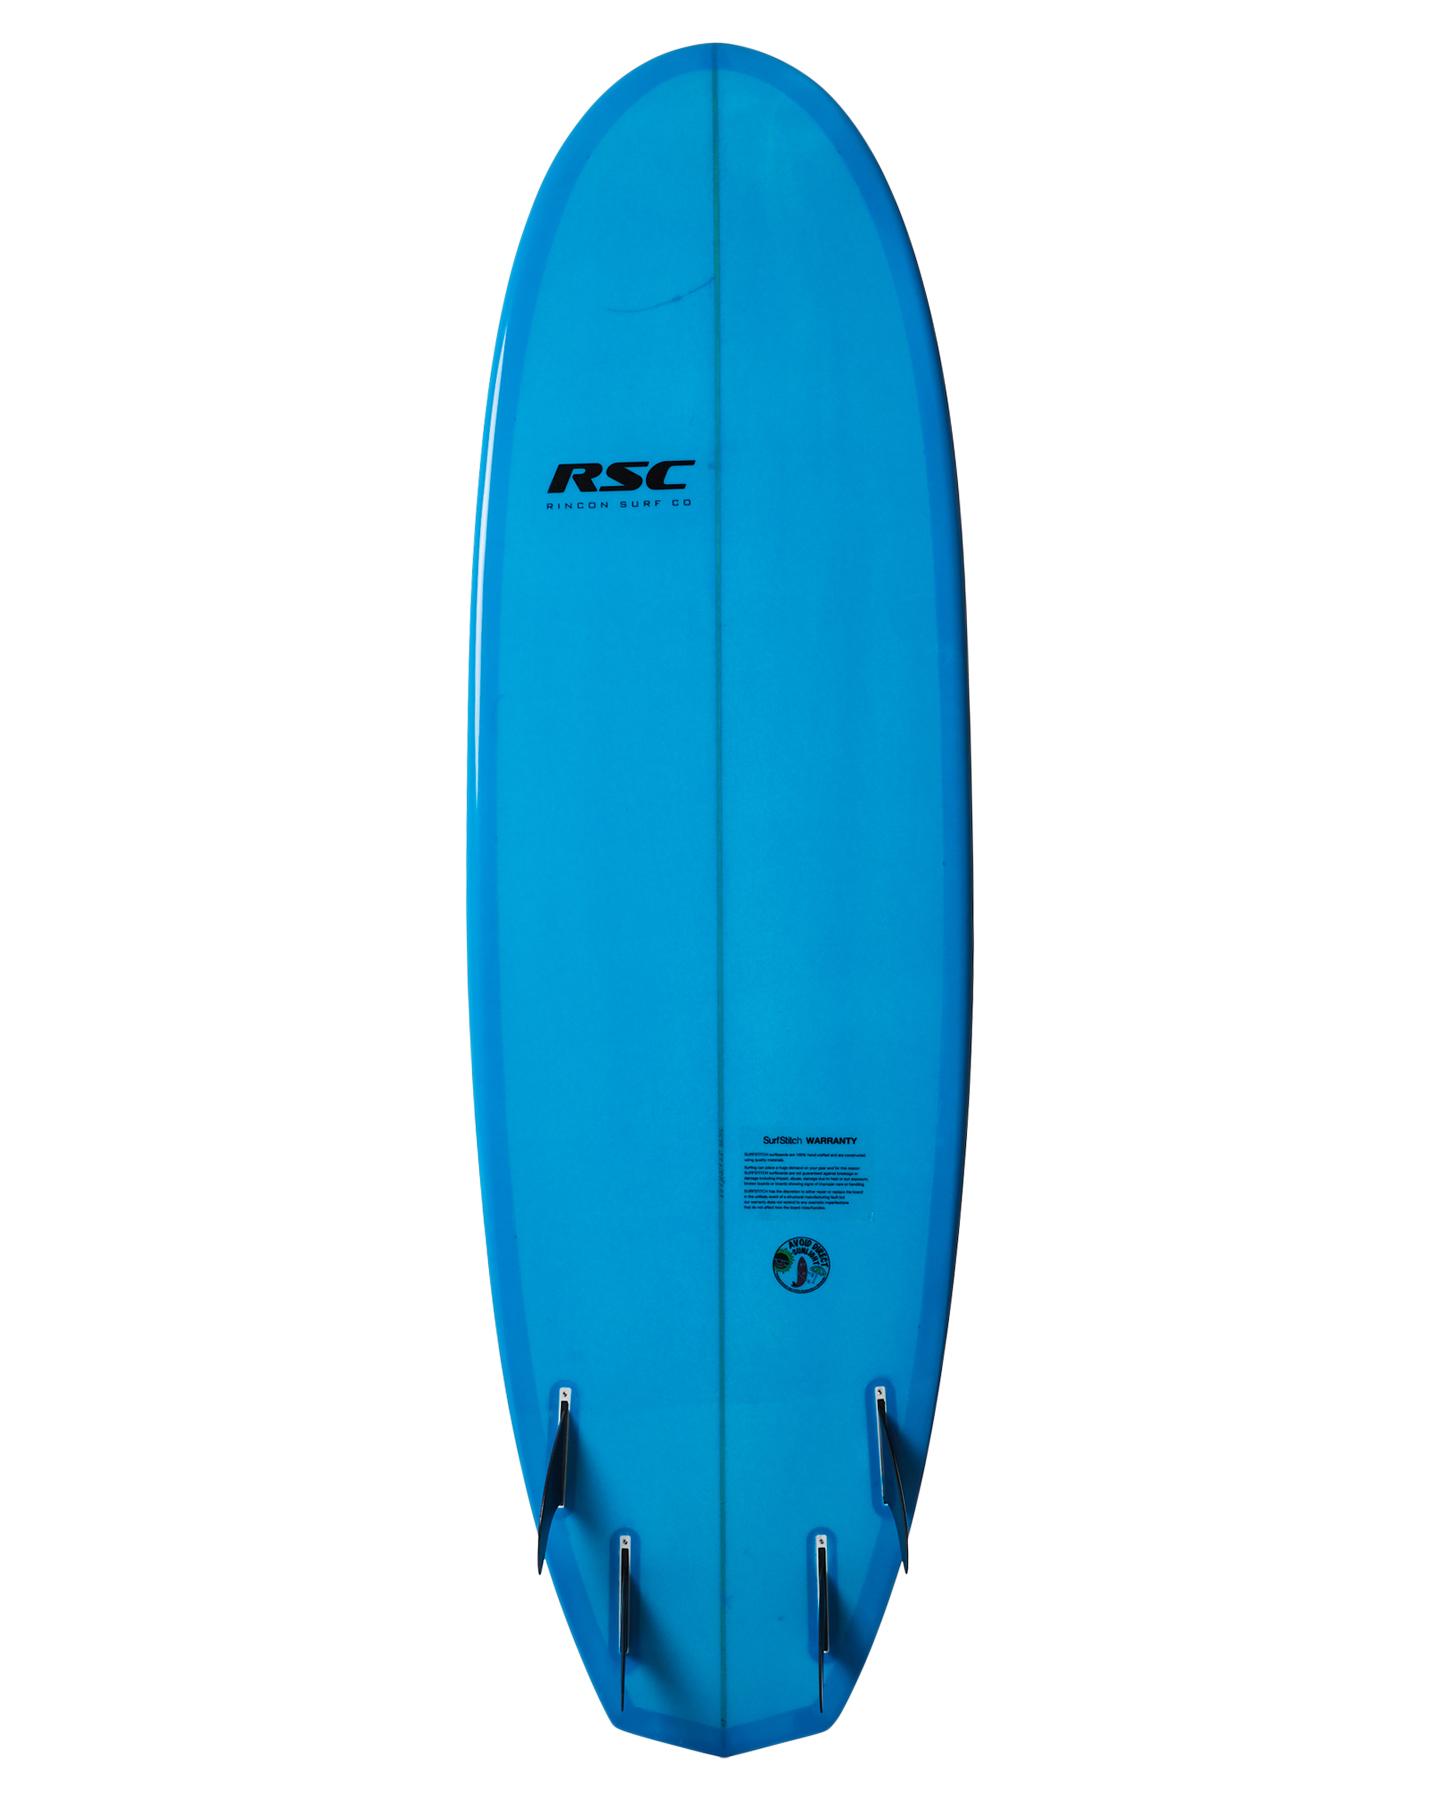 Rsc Surfboards Klapton Fish Surfboard